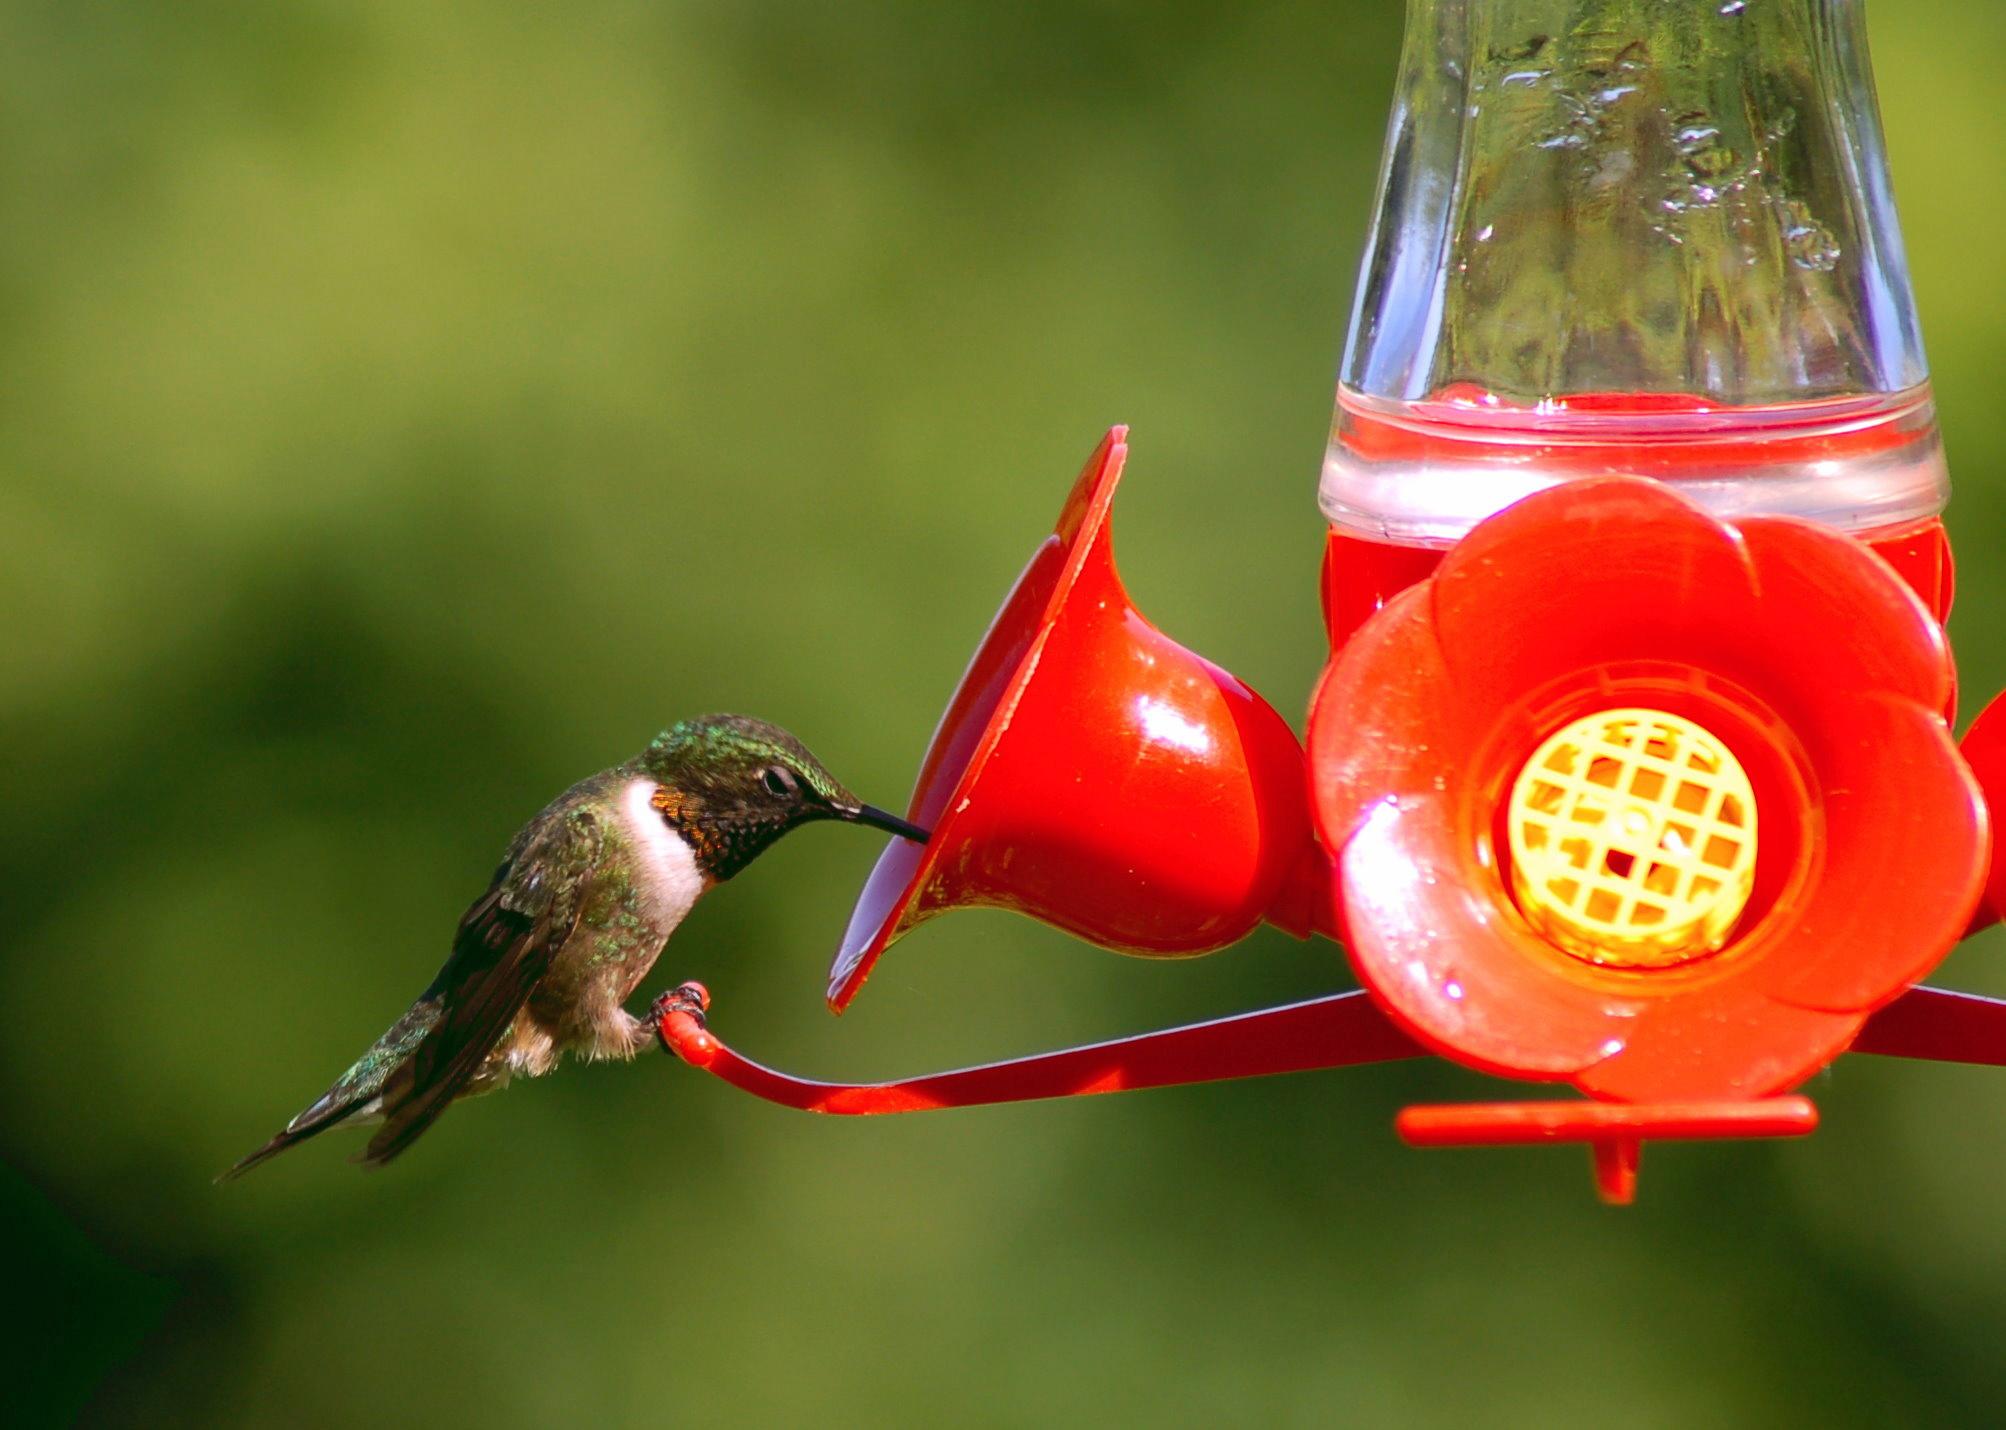 Hummingbird Feeders Guide | Blain's Farm & Fleet Blog